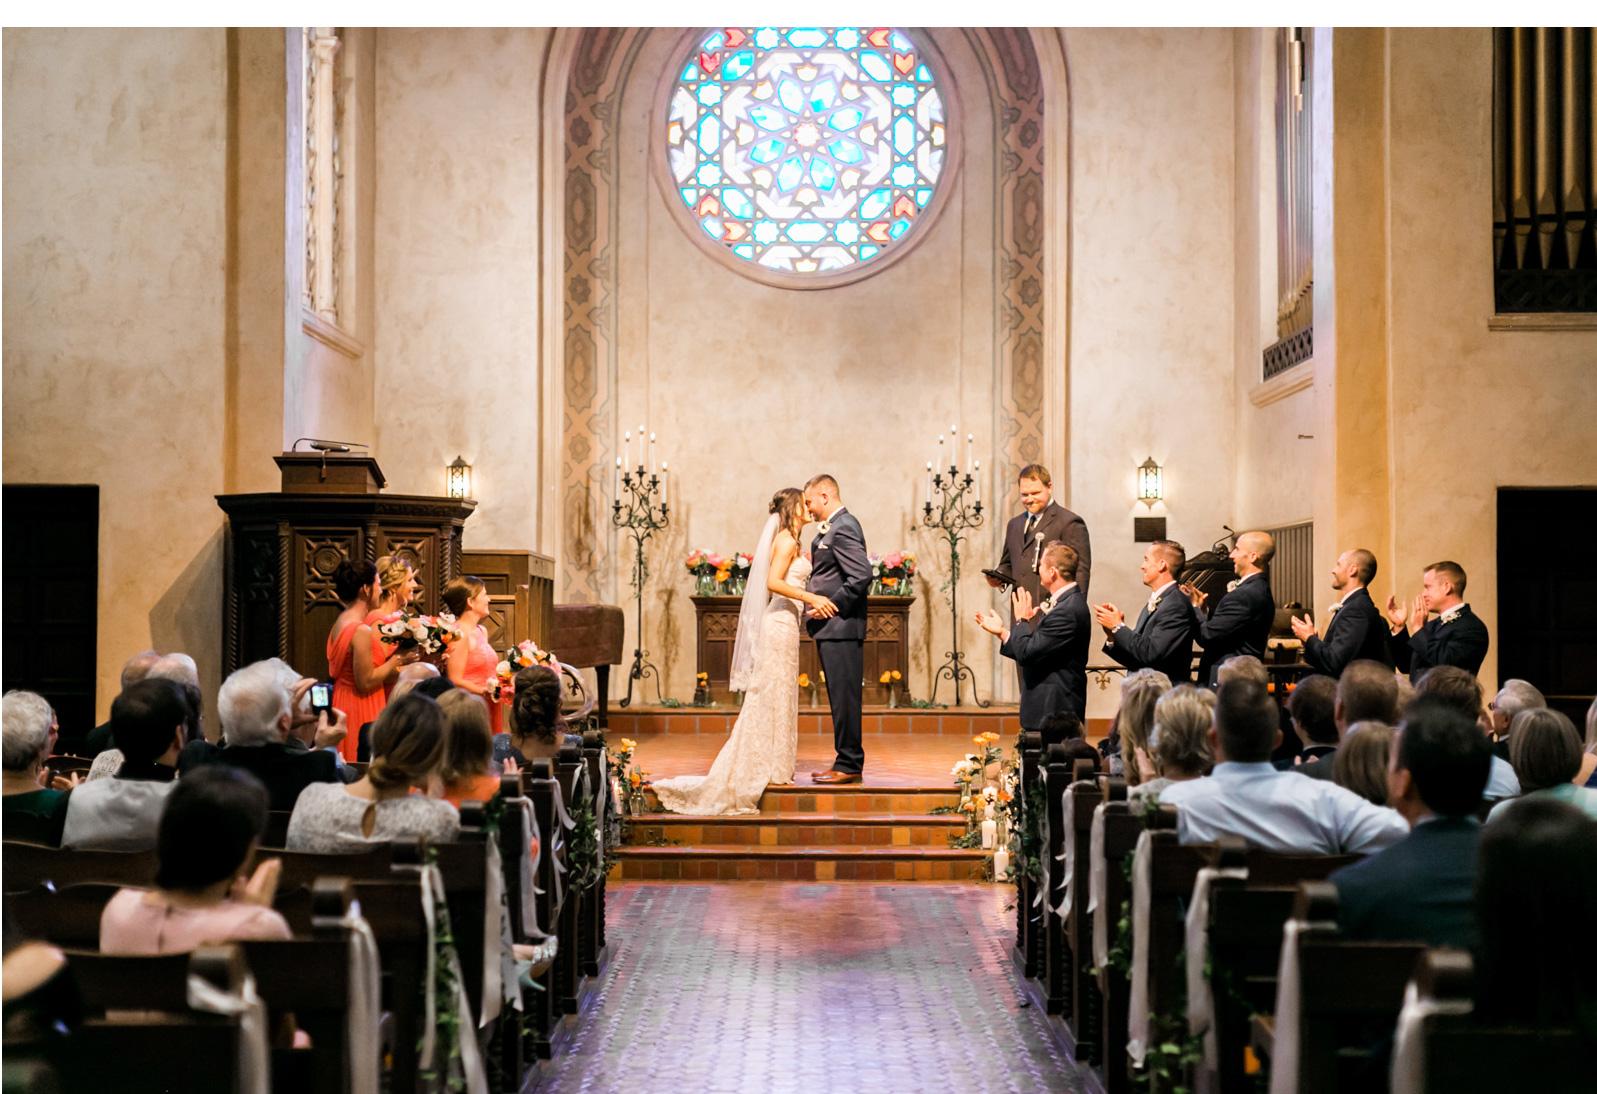 Southern-California-Santa-Barbara-Wedding-Photographer-Natalie-Schutt-Photography_23.jpg